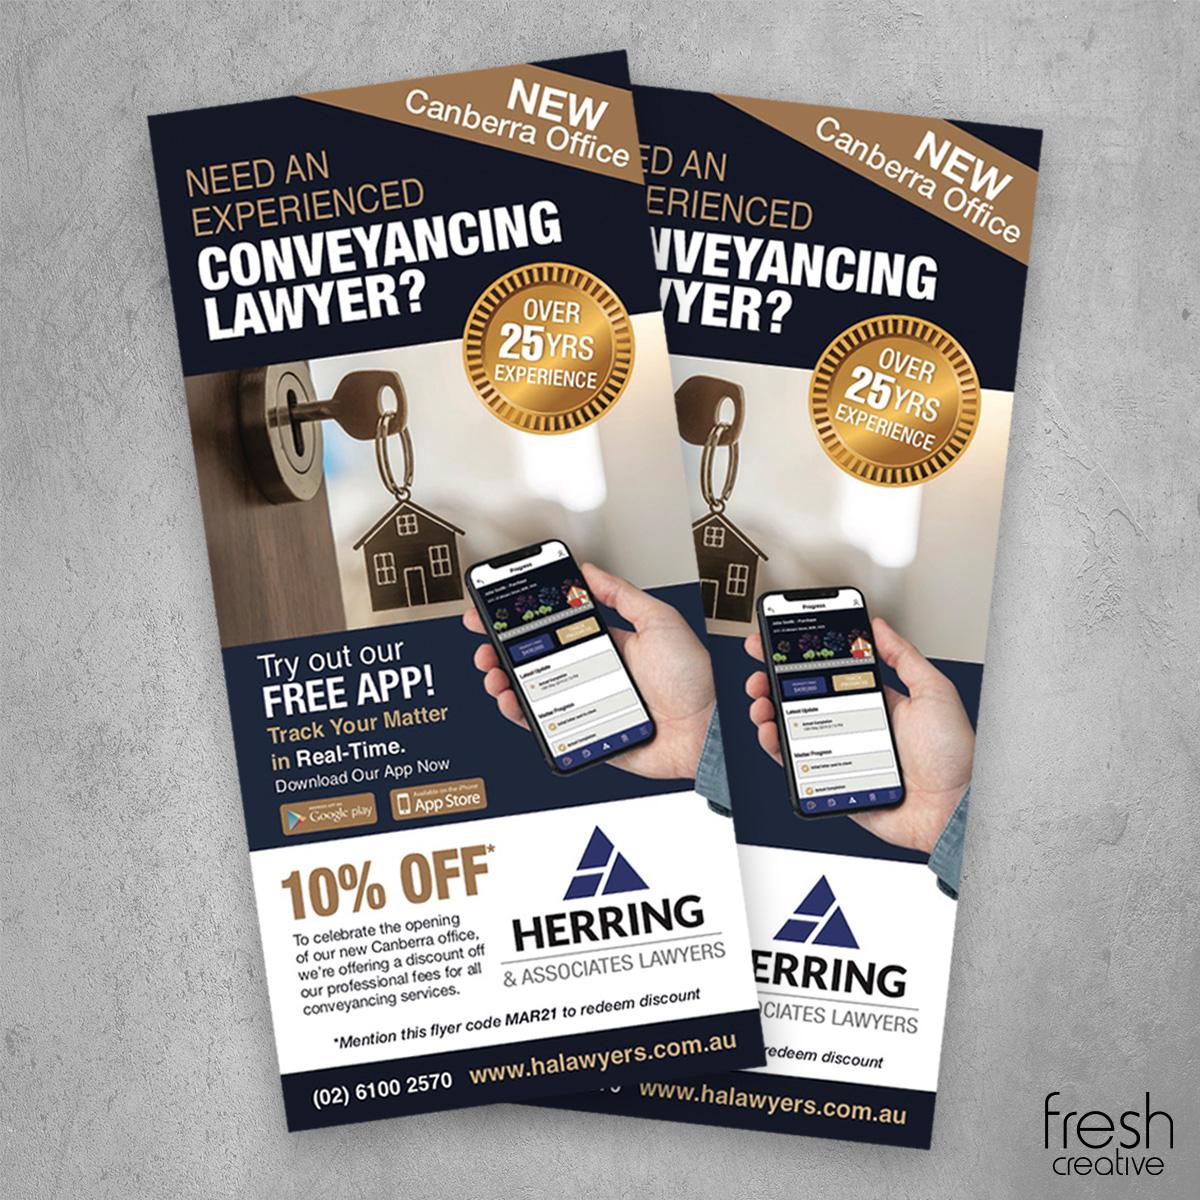 Herring and Associates Lawyers Custom DL Flyer